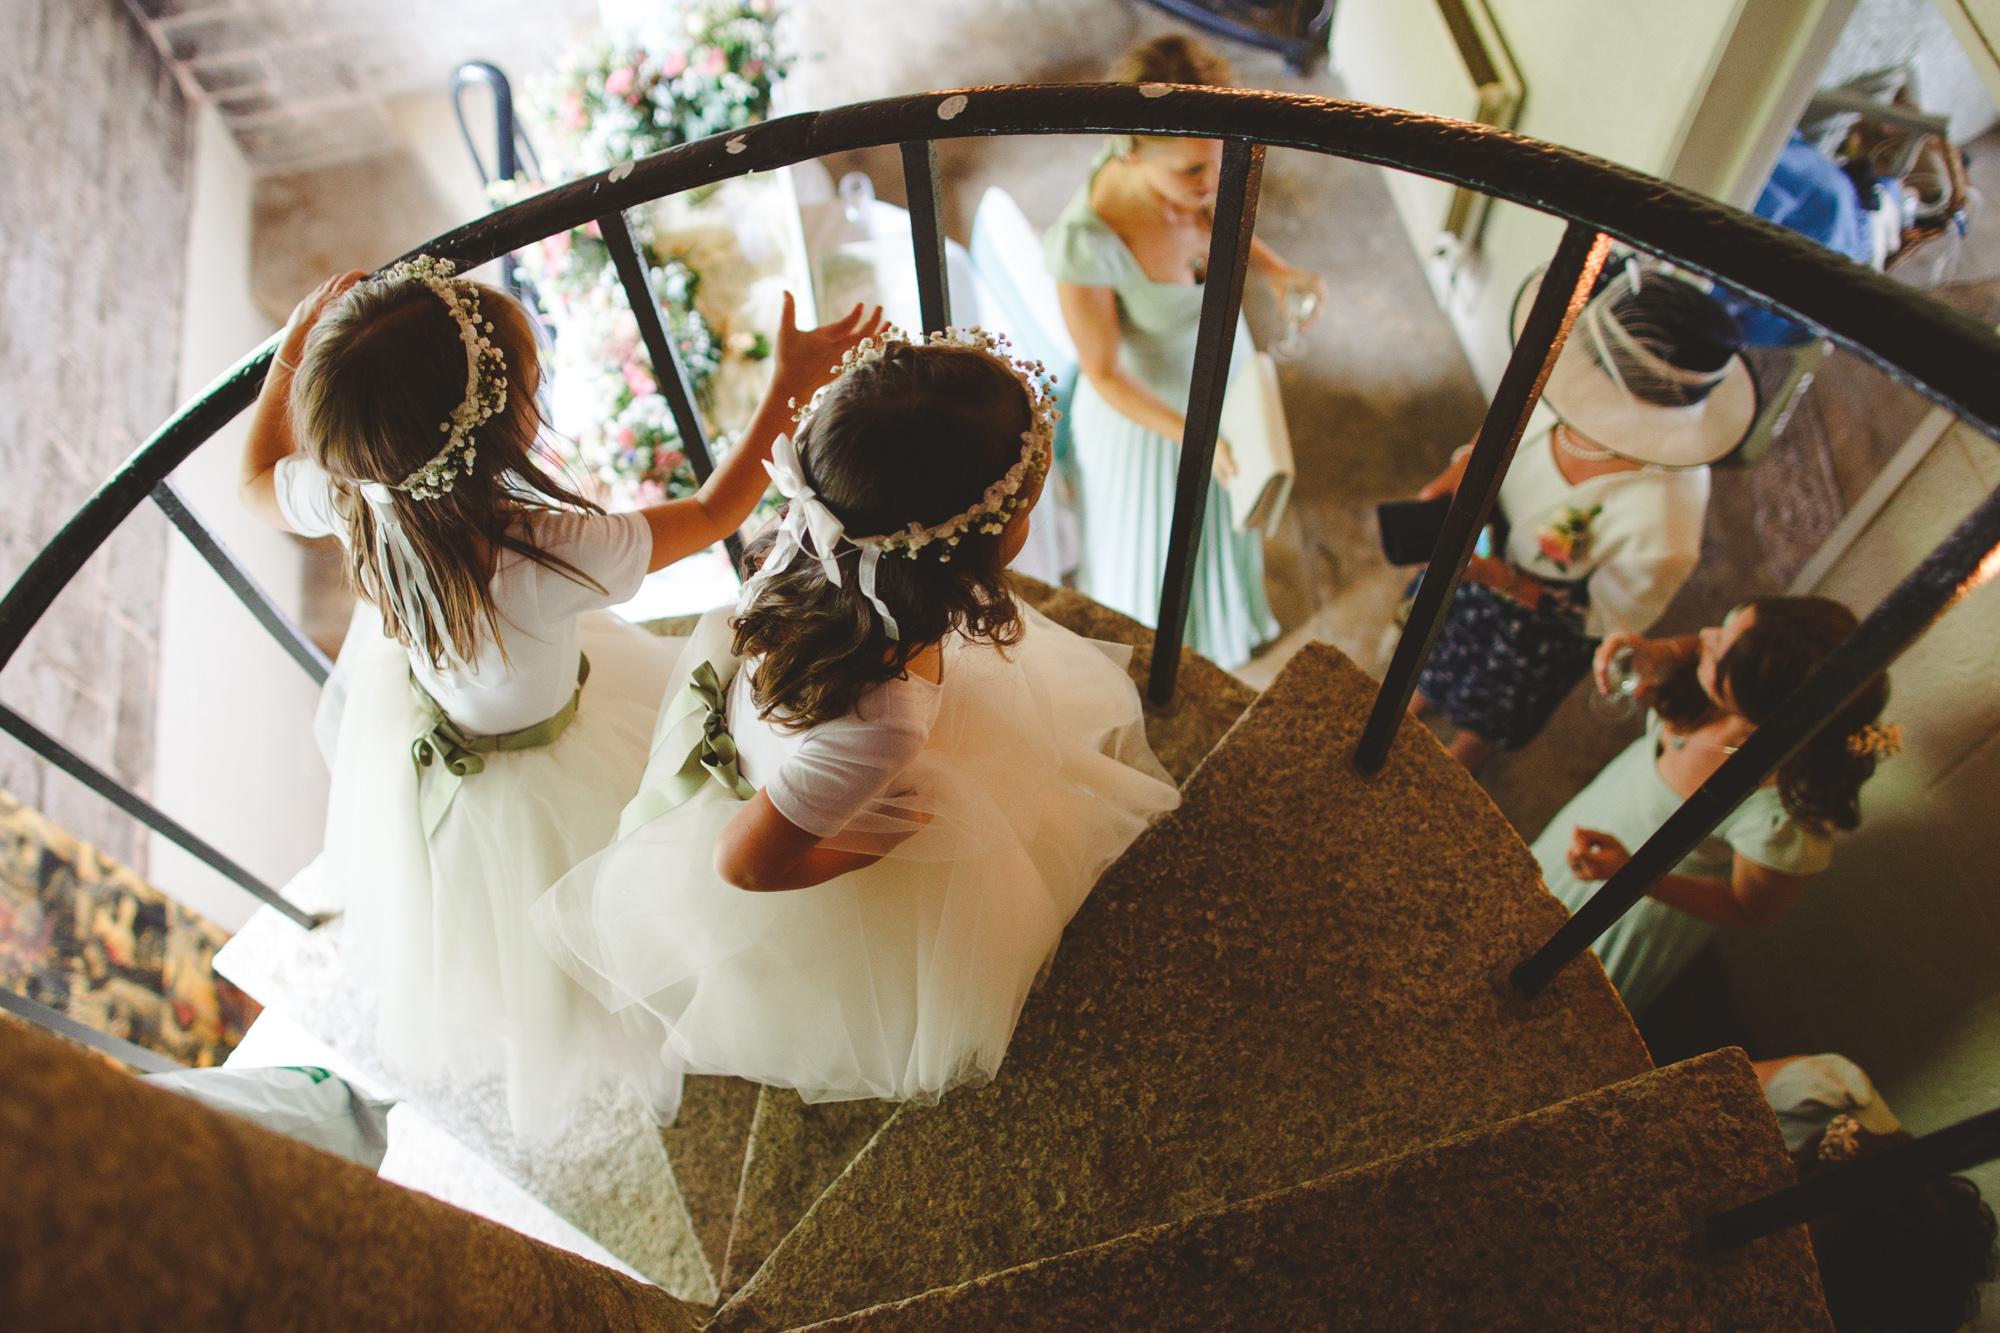 cornwall-alternative-wedding-photographer-beach-wedding-3.jpg